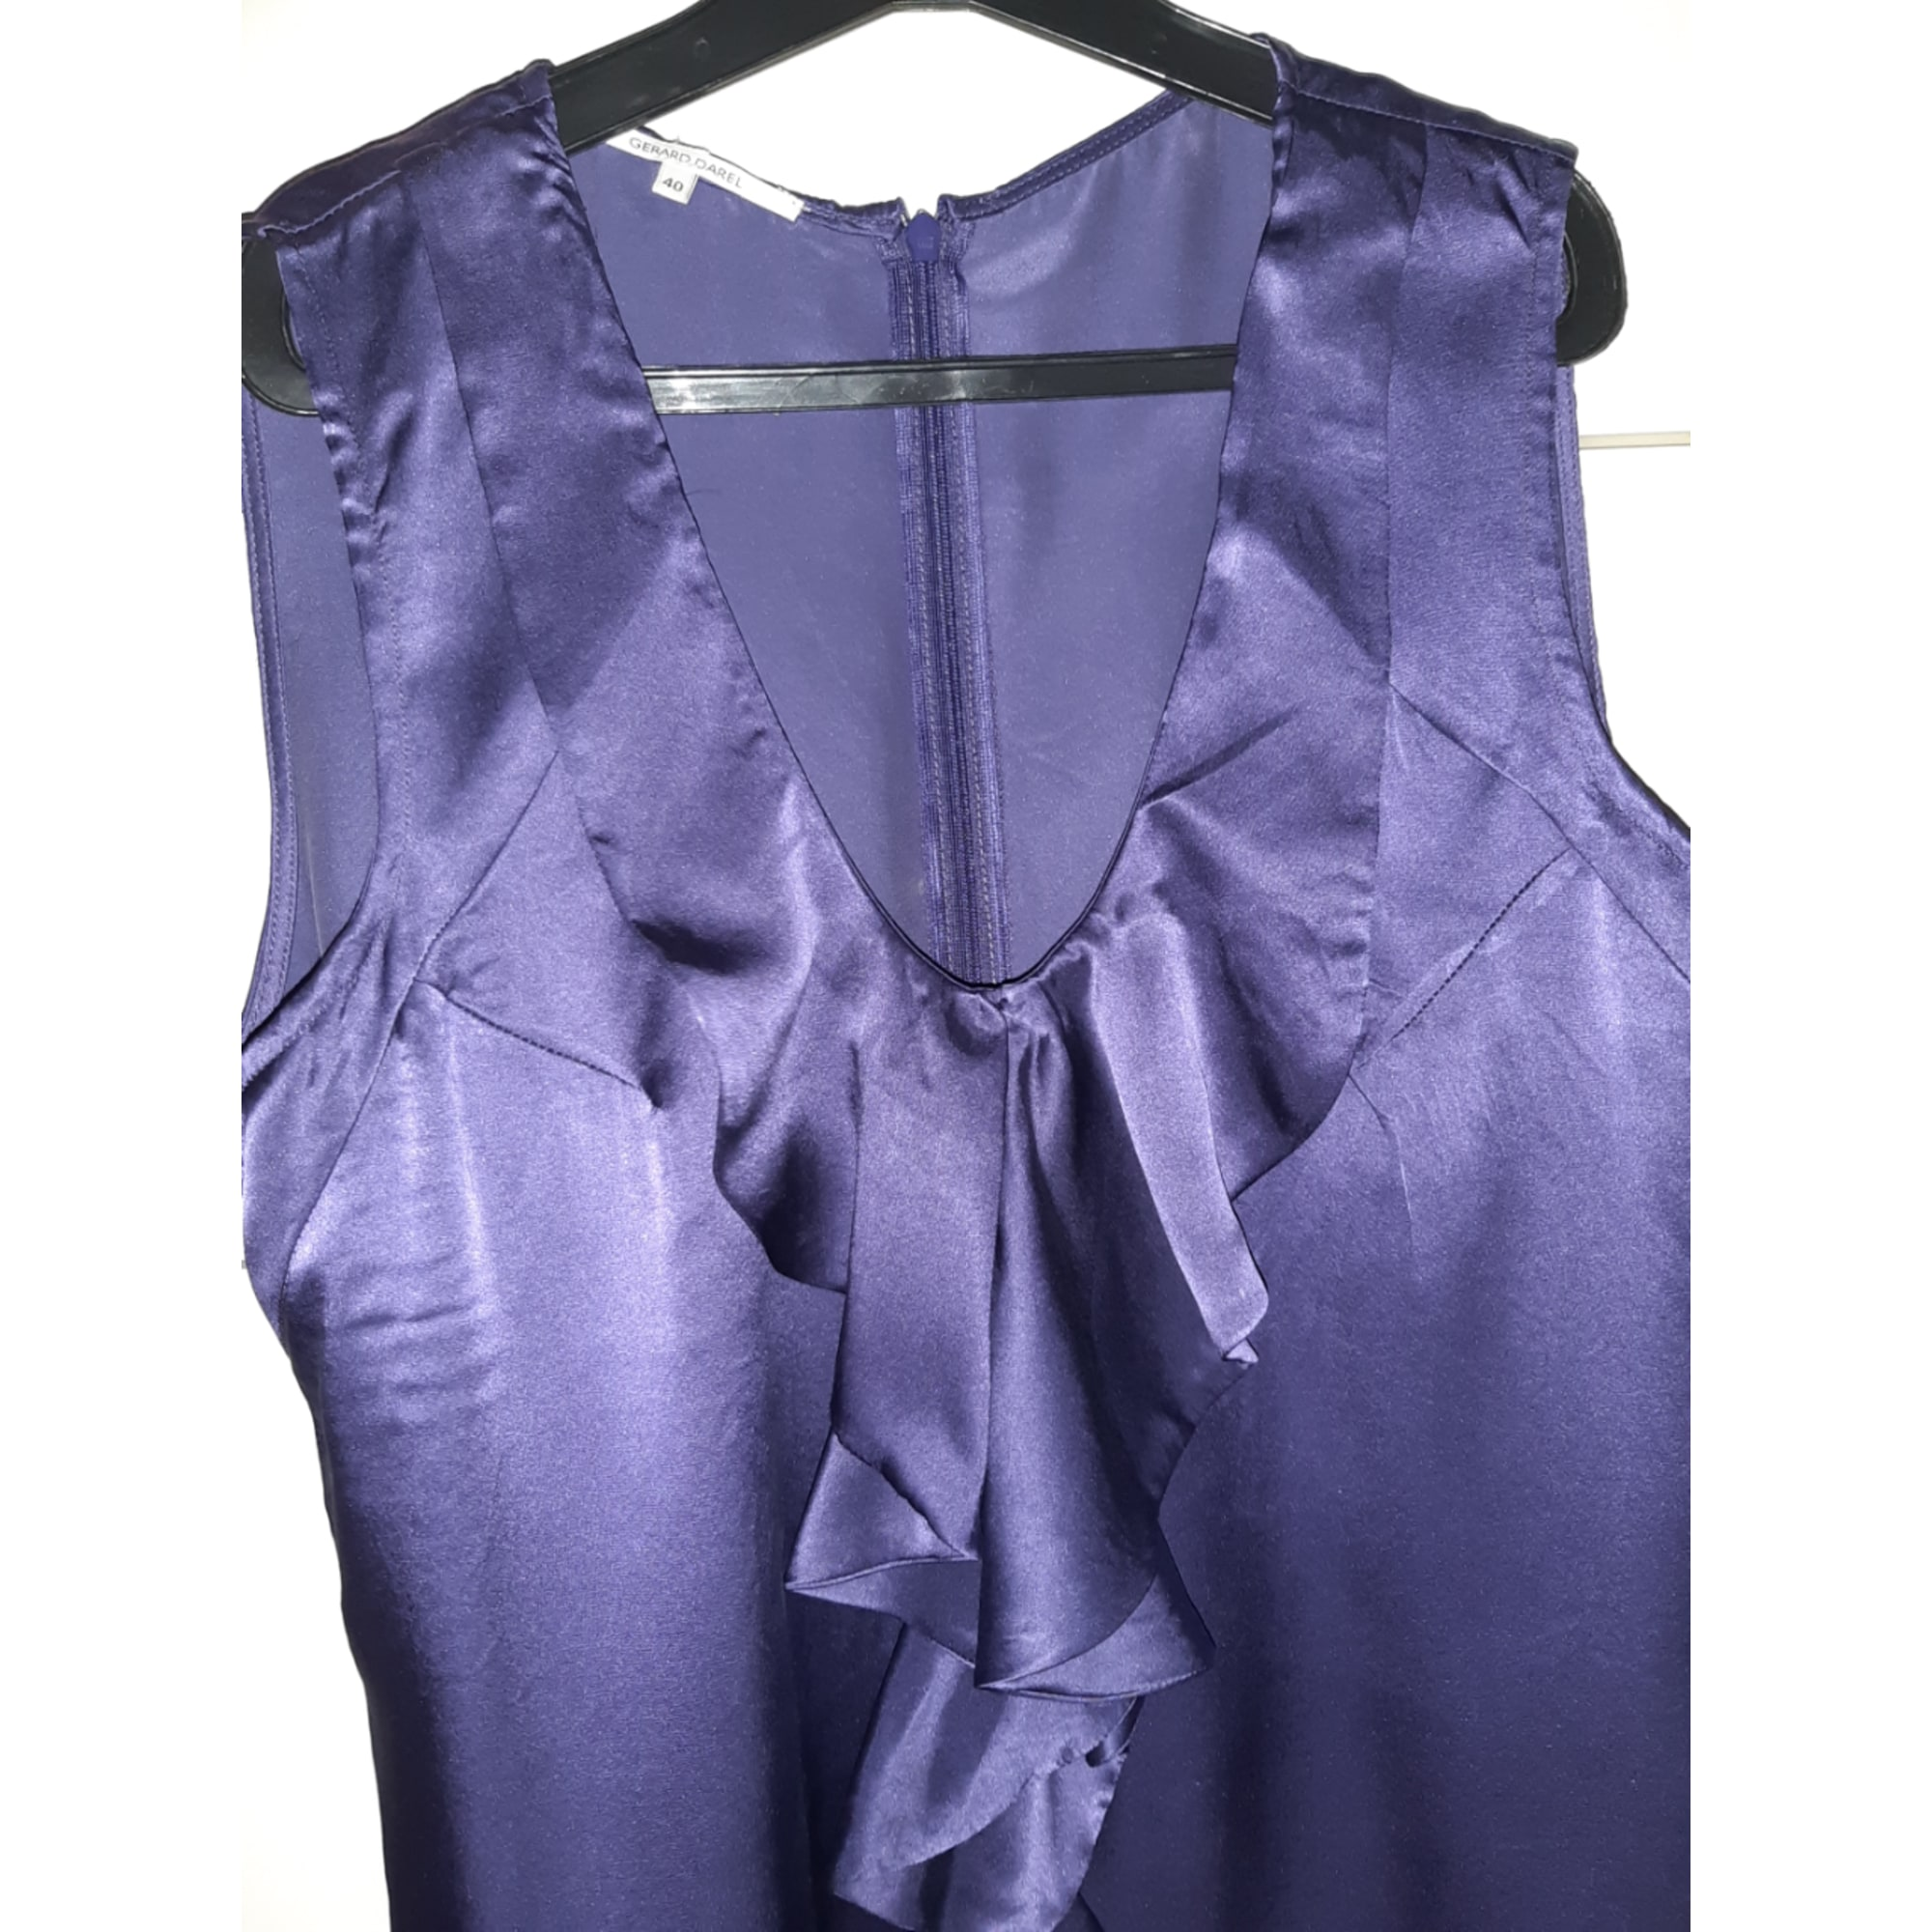 Top, tee-shirt GERARD DAREL Violet, mauve, lavande